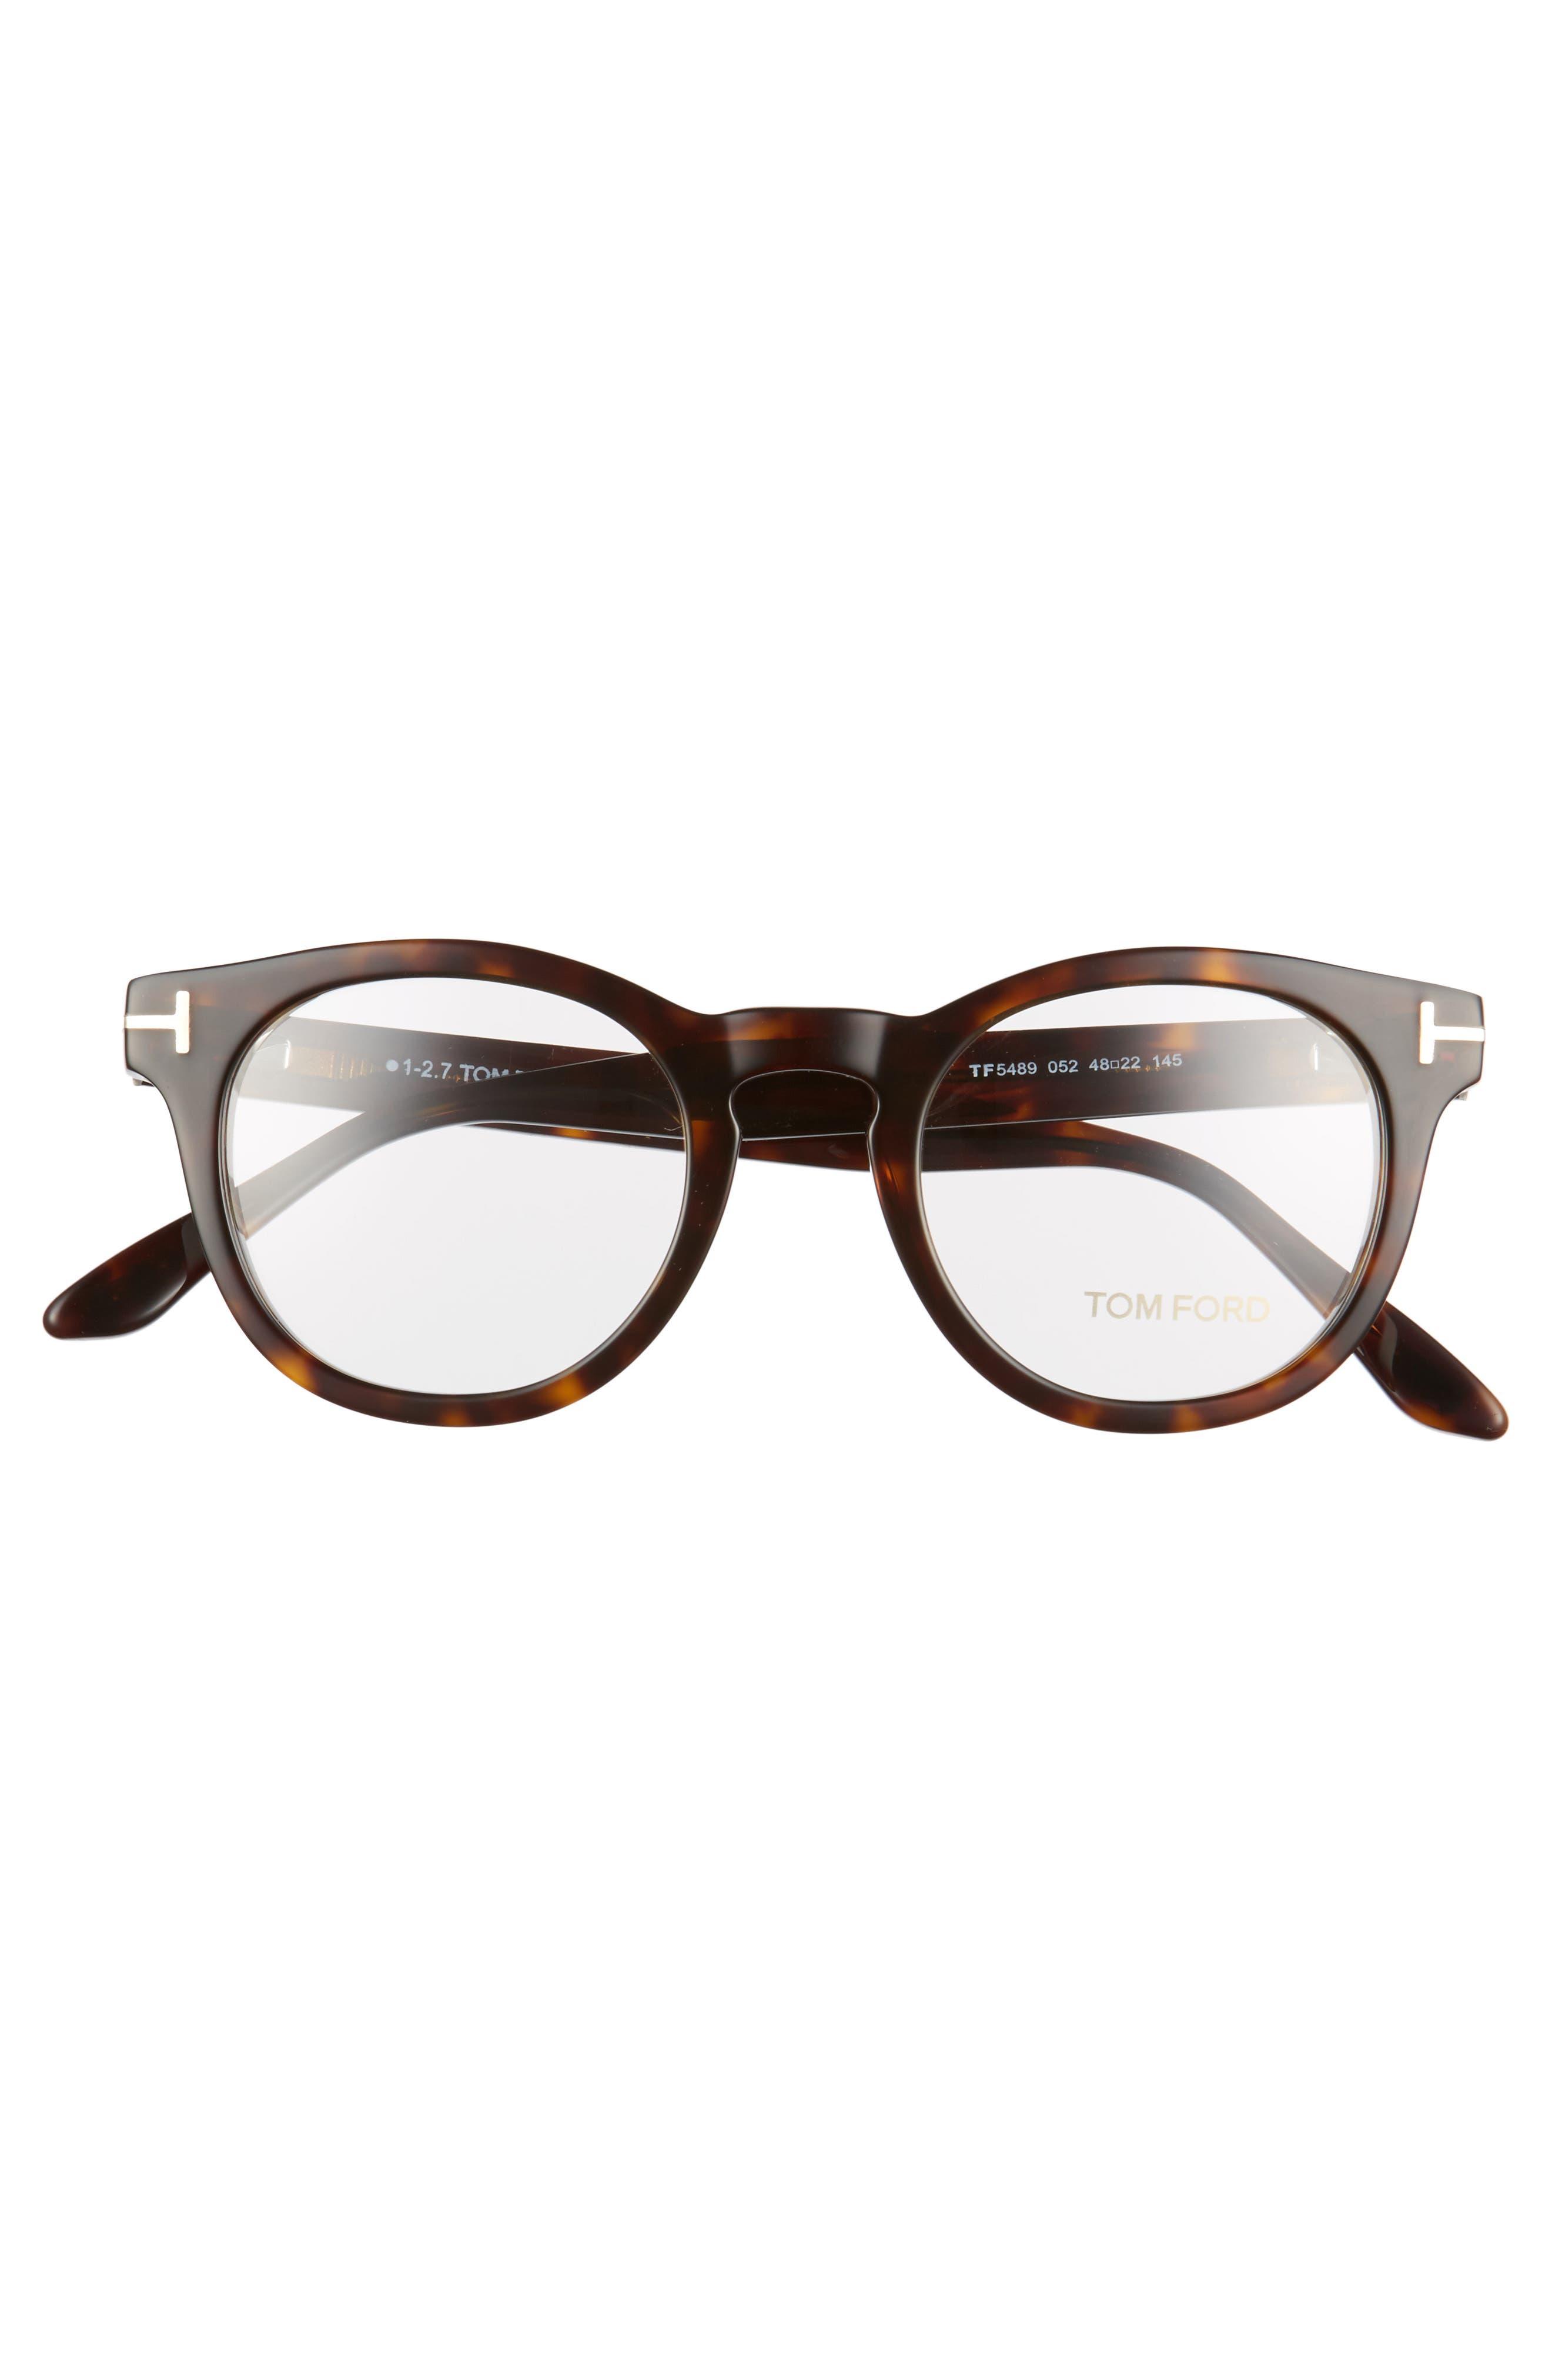 48mm Round Optical Glasses,                             Alternate thumbnail 3, color,                             Classic Dark Havana